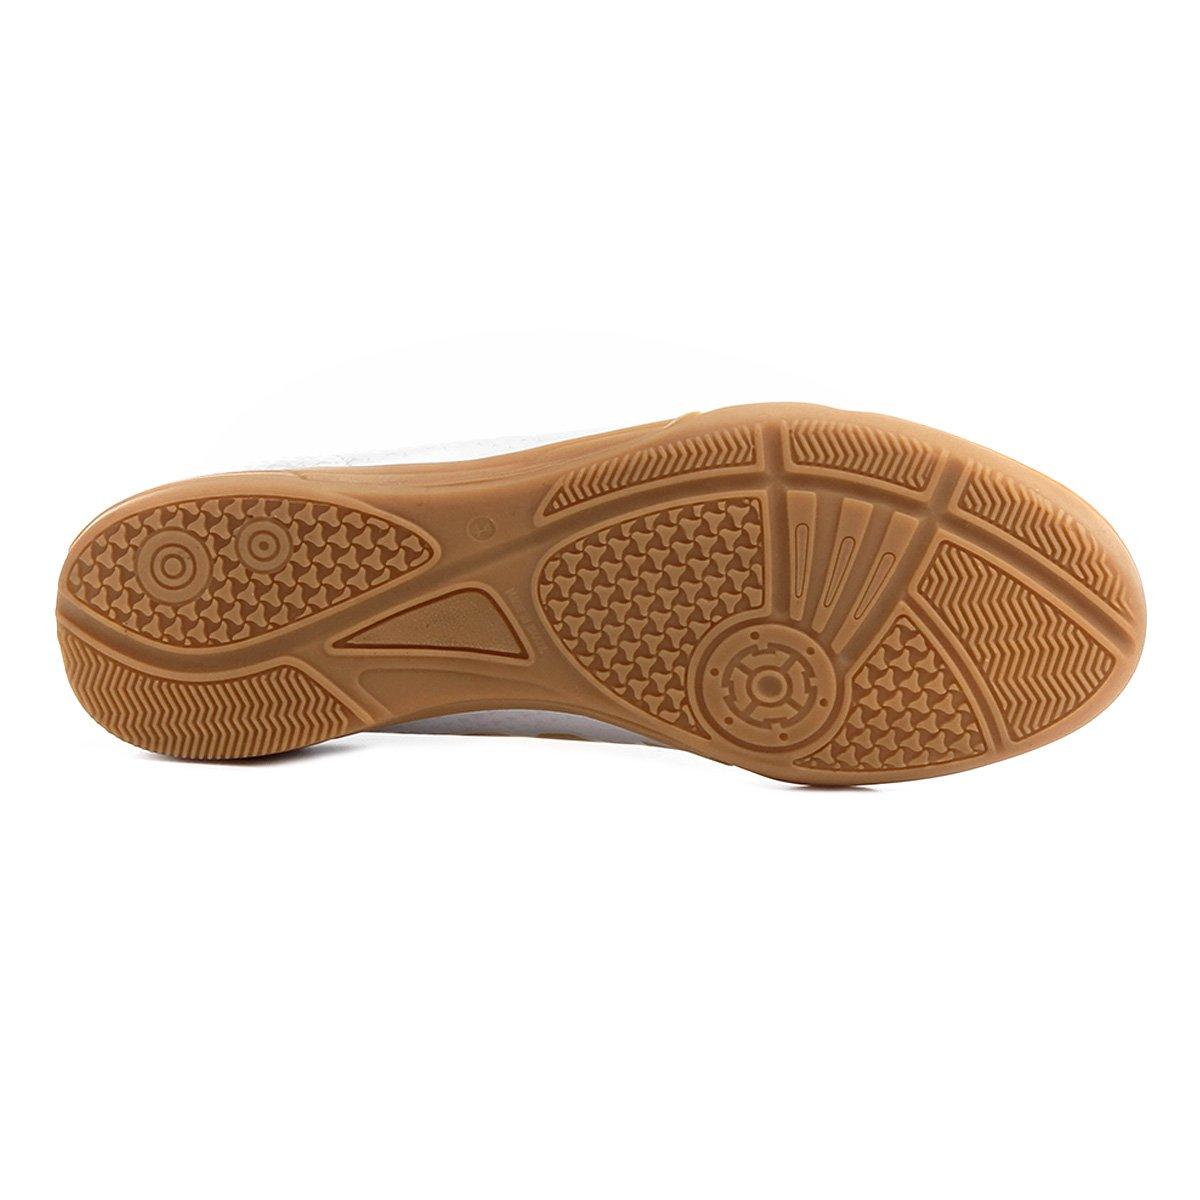 789936e365 Chuteira Futsal Kappa Údine - Gelo e Preto - Compre Agora